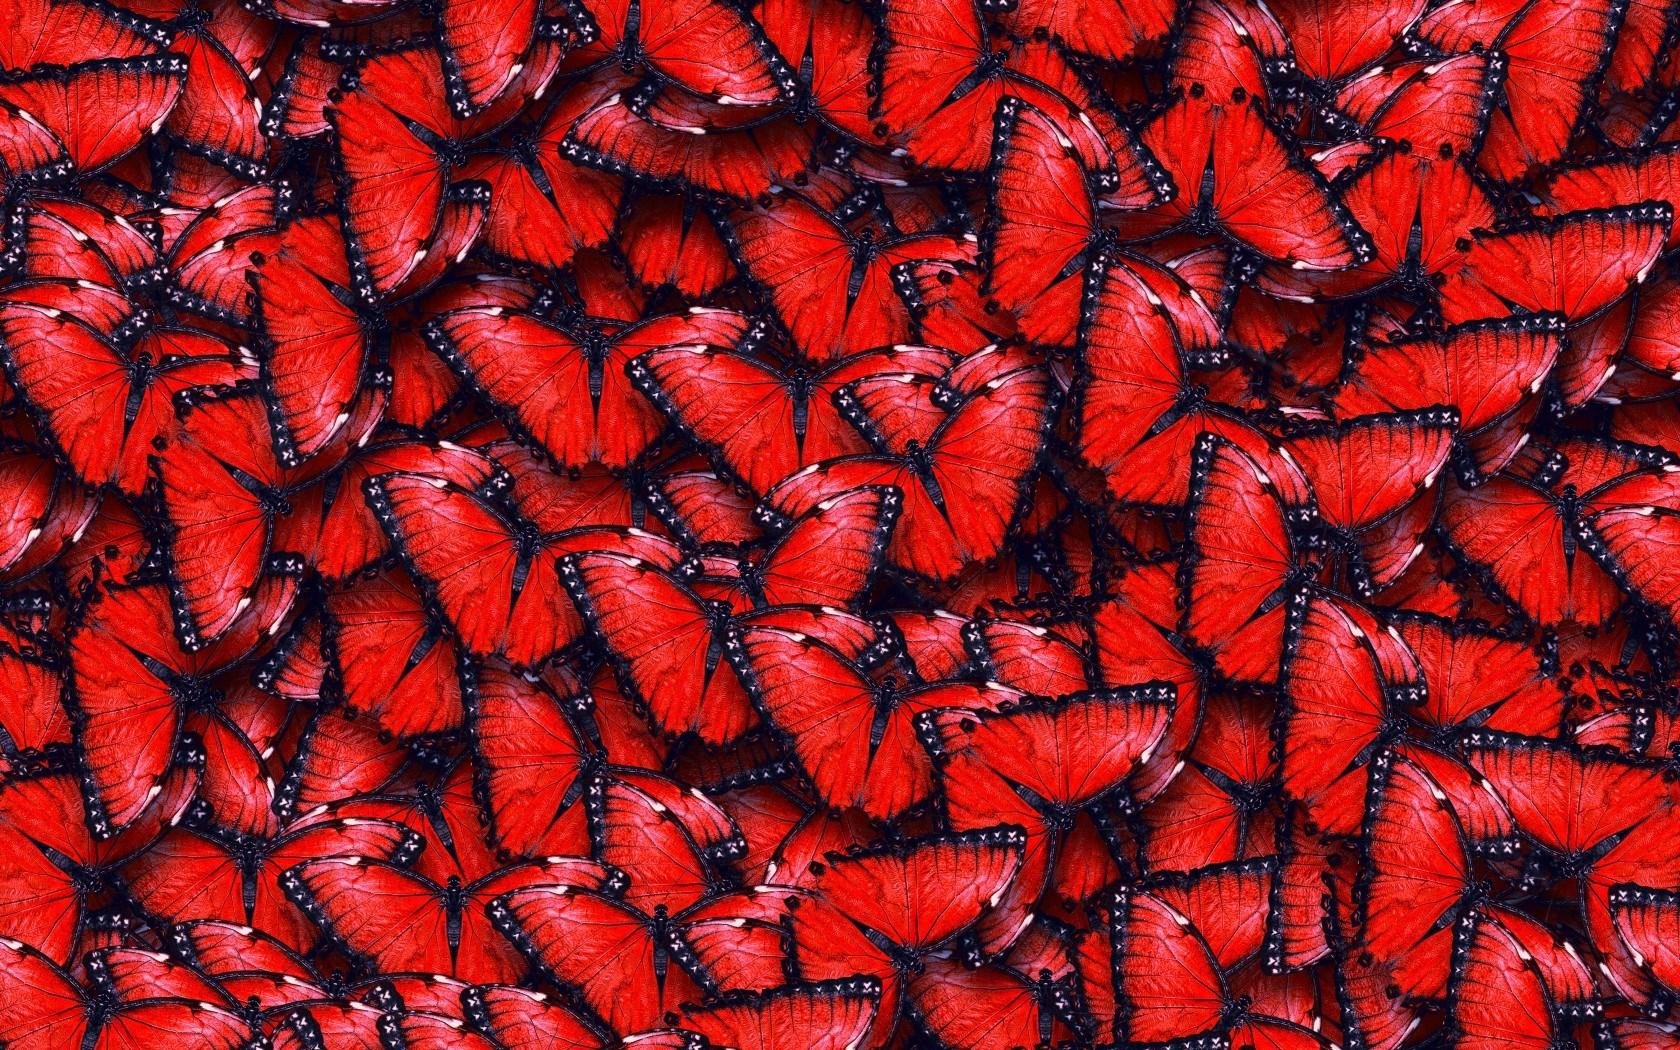 Red Butterfly Wallpaper - WallpaperSafari